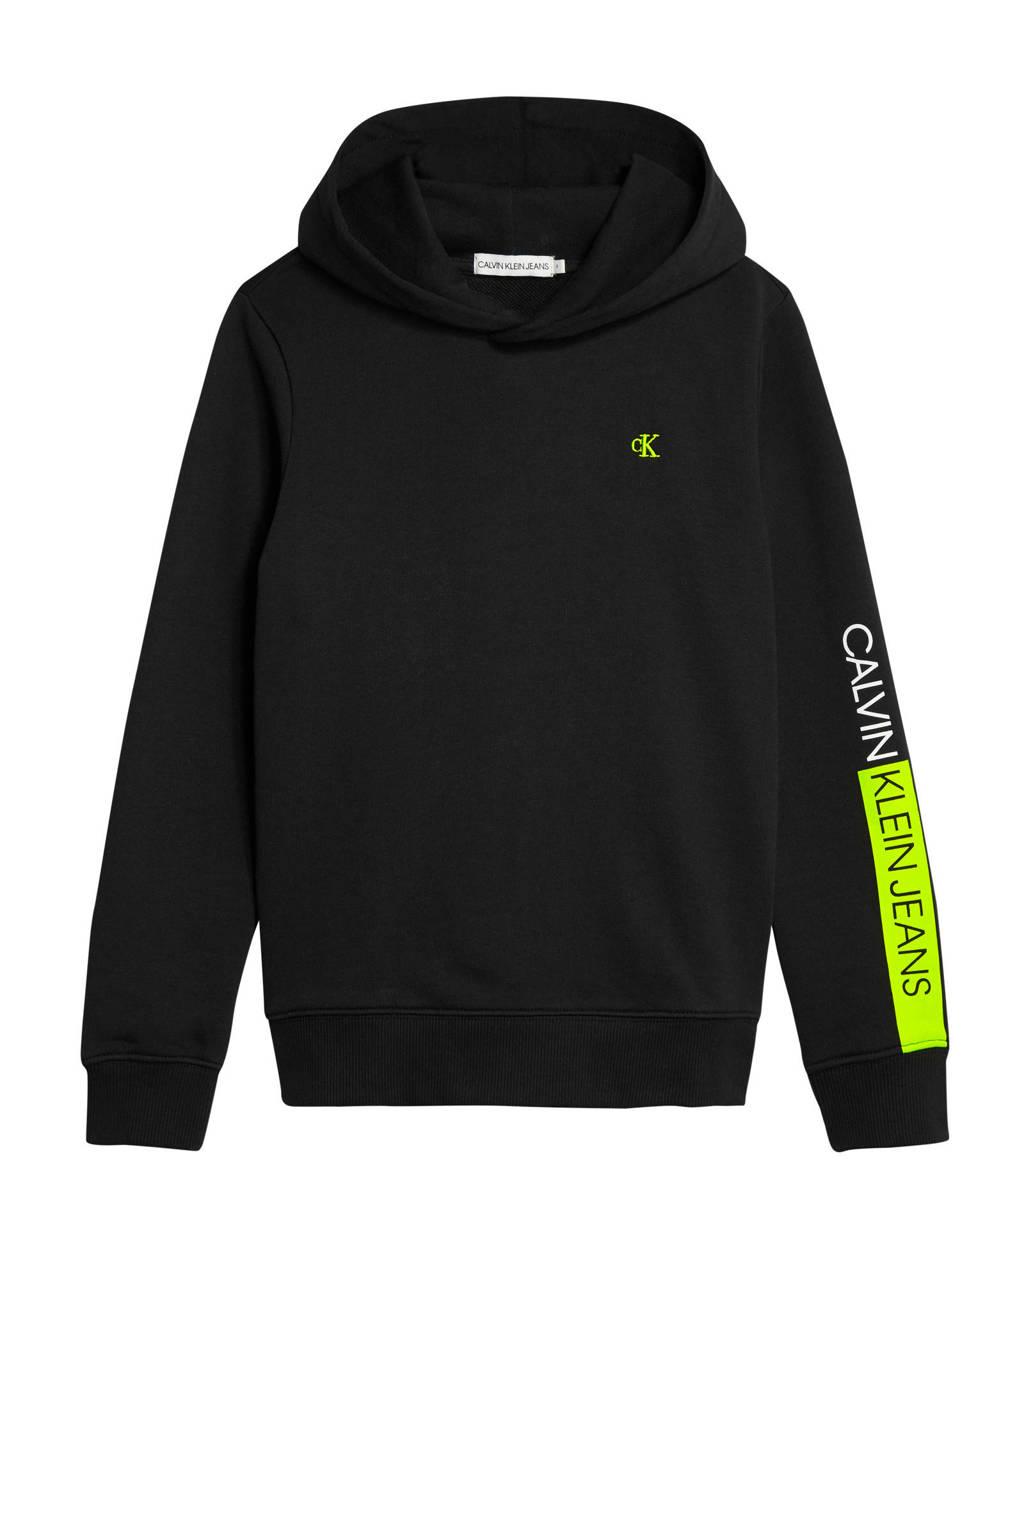 CALVIN KLEIN JEANS hoodie met logo en borduursels zwart/geel, Zwart/geel